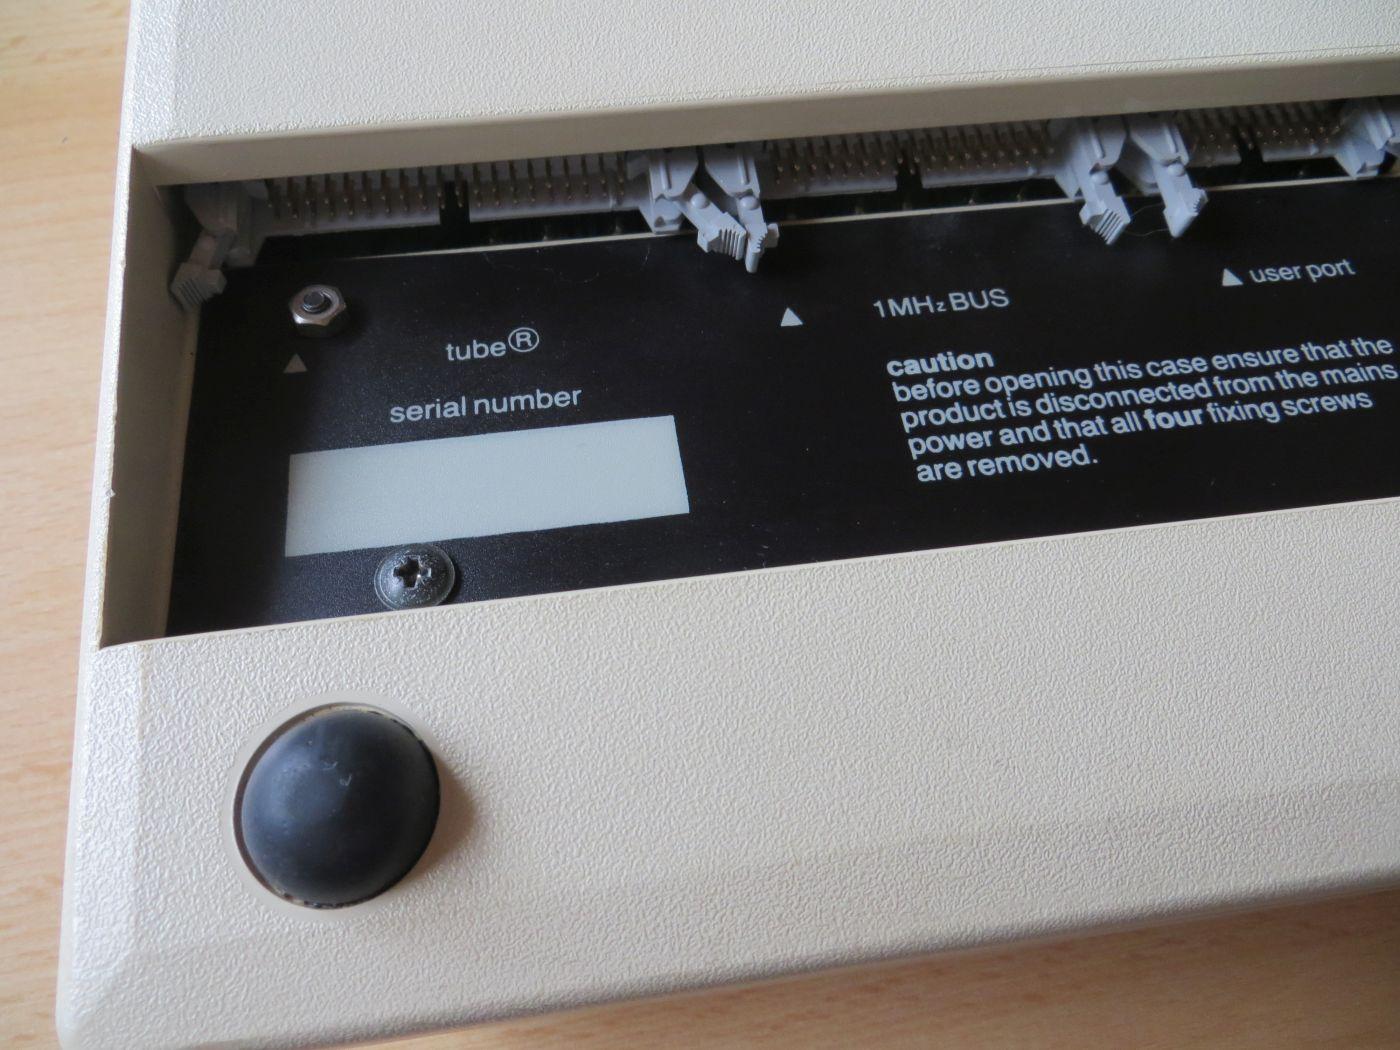 Acorn BBC Micro Model B - Unterseite - Anschlüsse - Tube - 1MHz Bus - user port